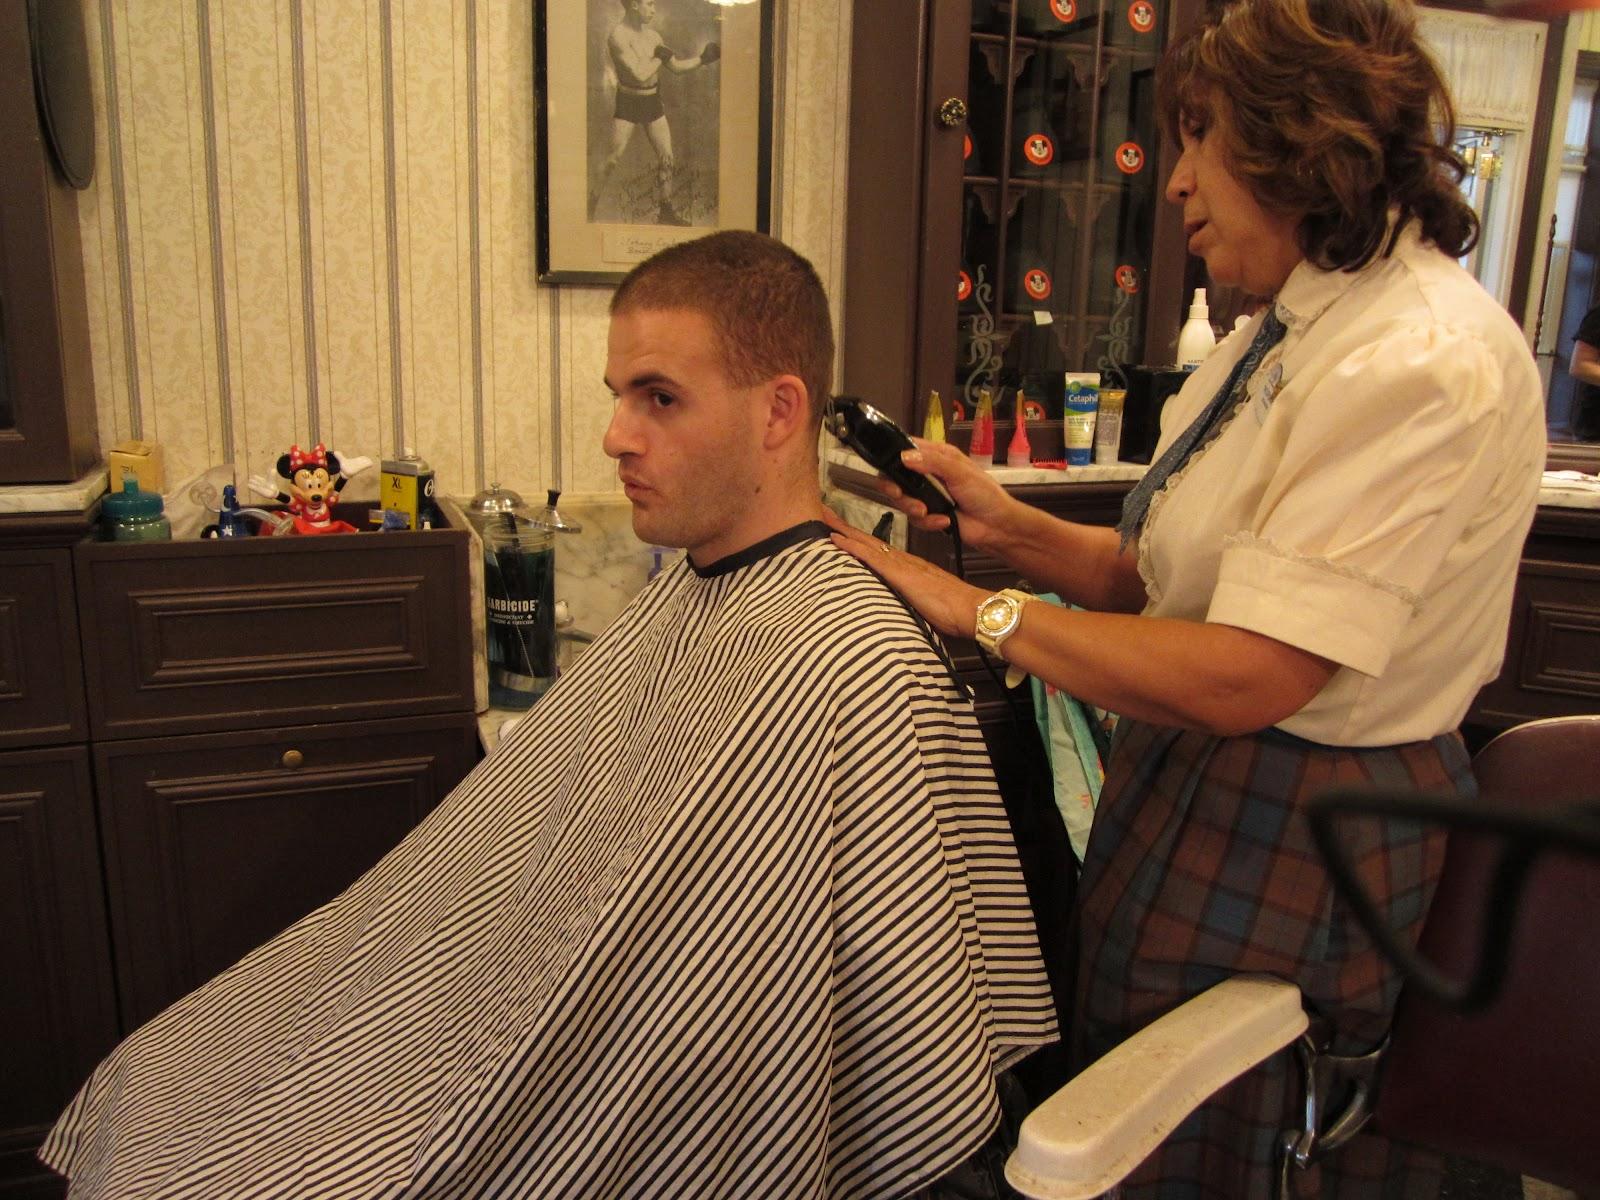 Female Haircut Stories Barbershop Holidays